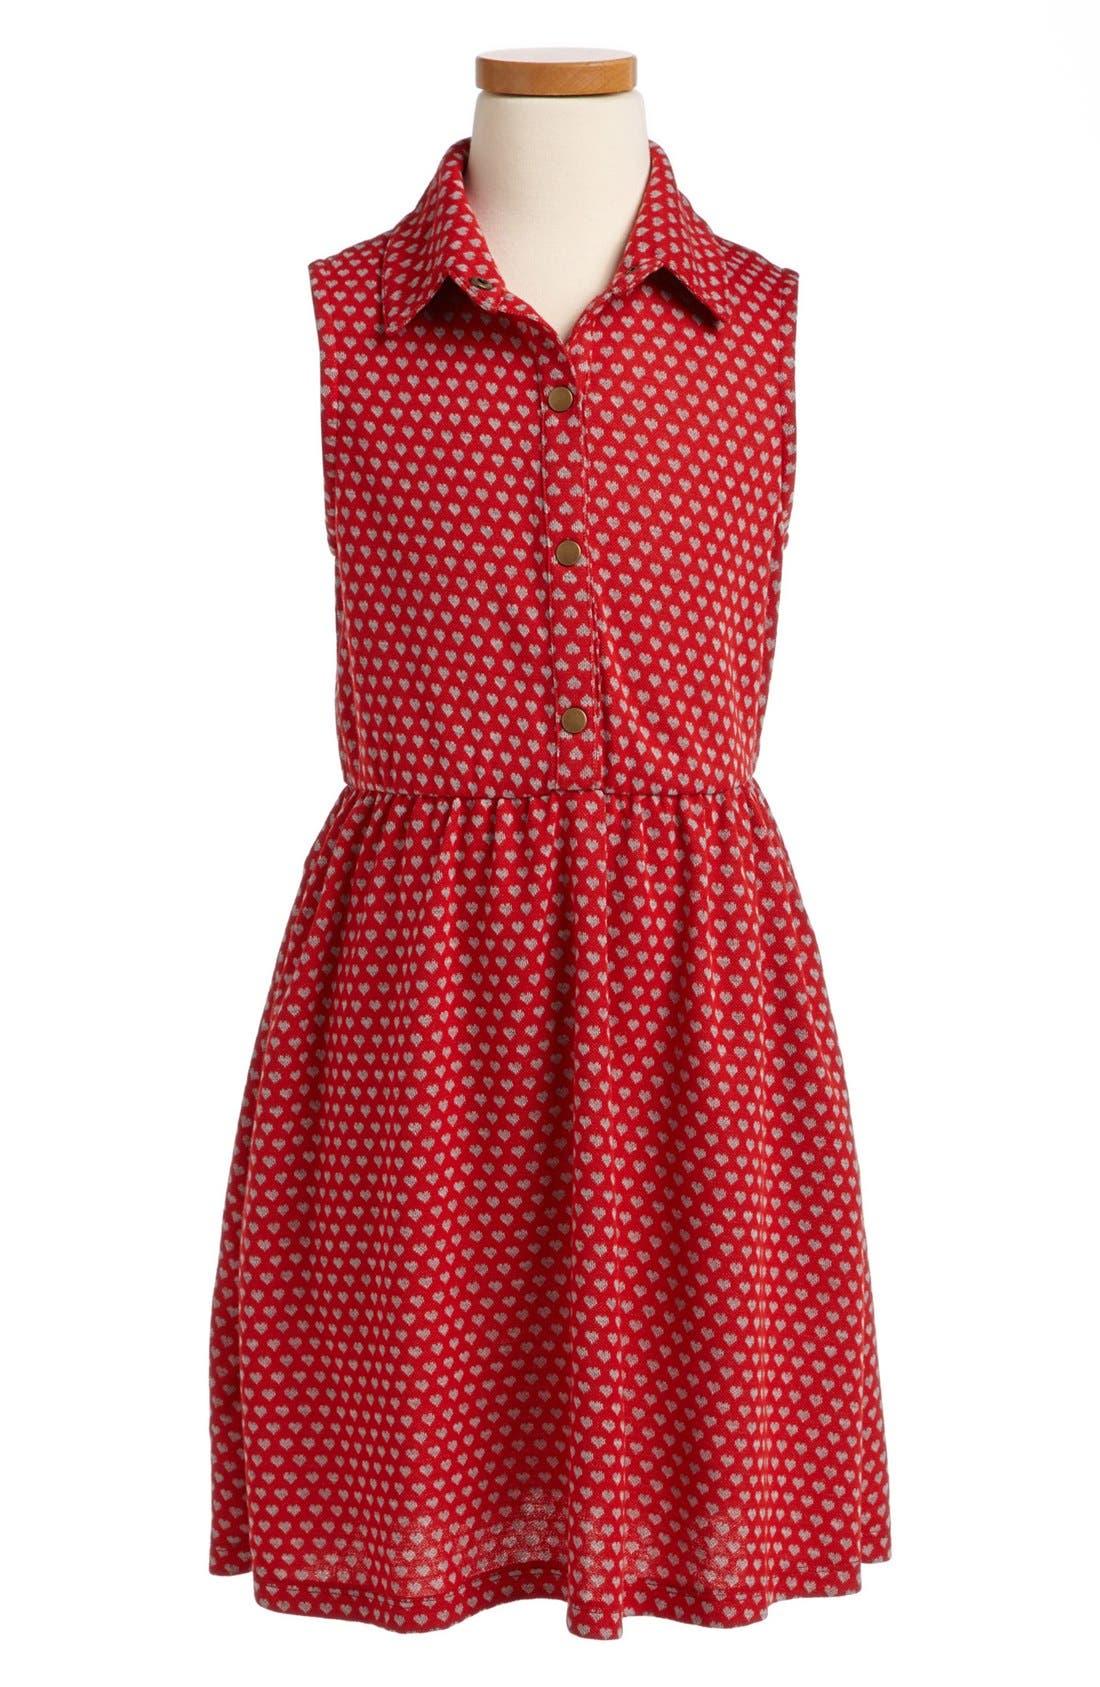 Main Image - Mia Chica 'Heart' Dress (Big Girls)